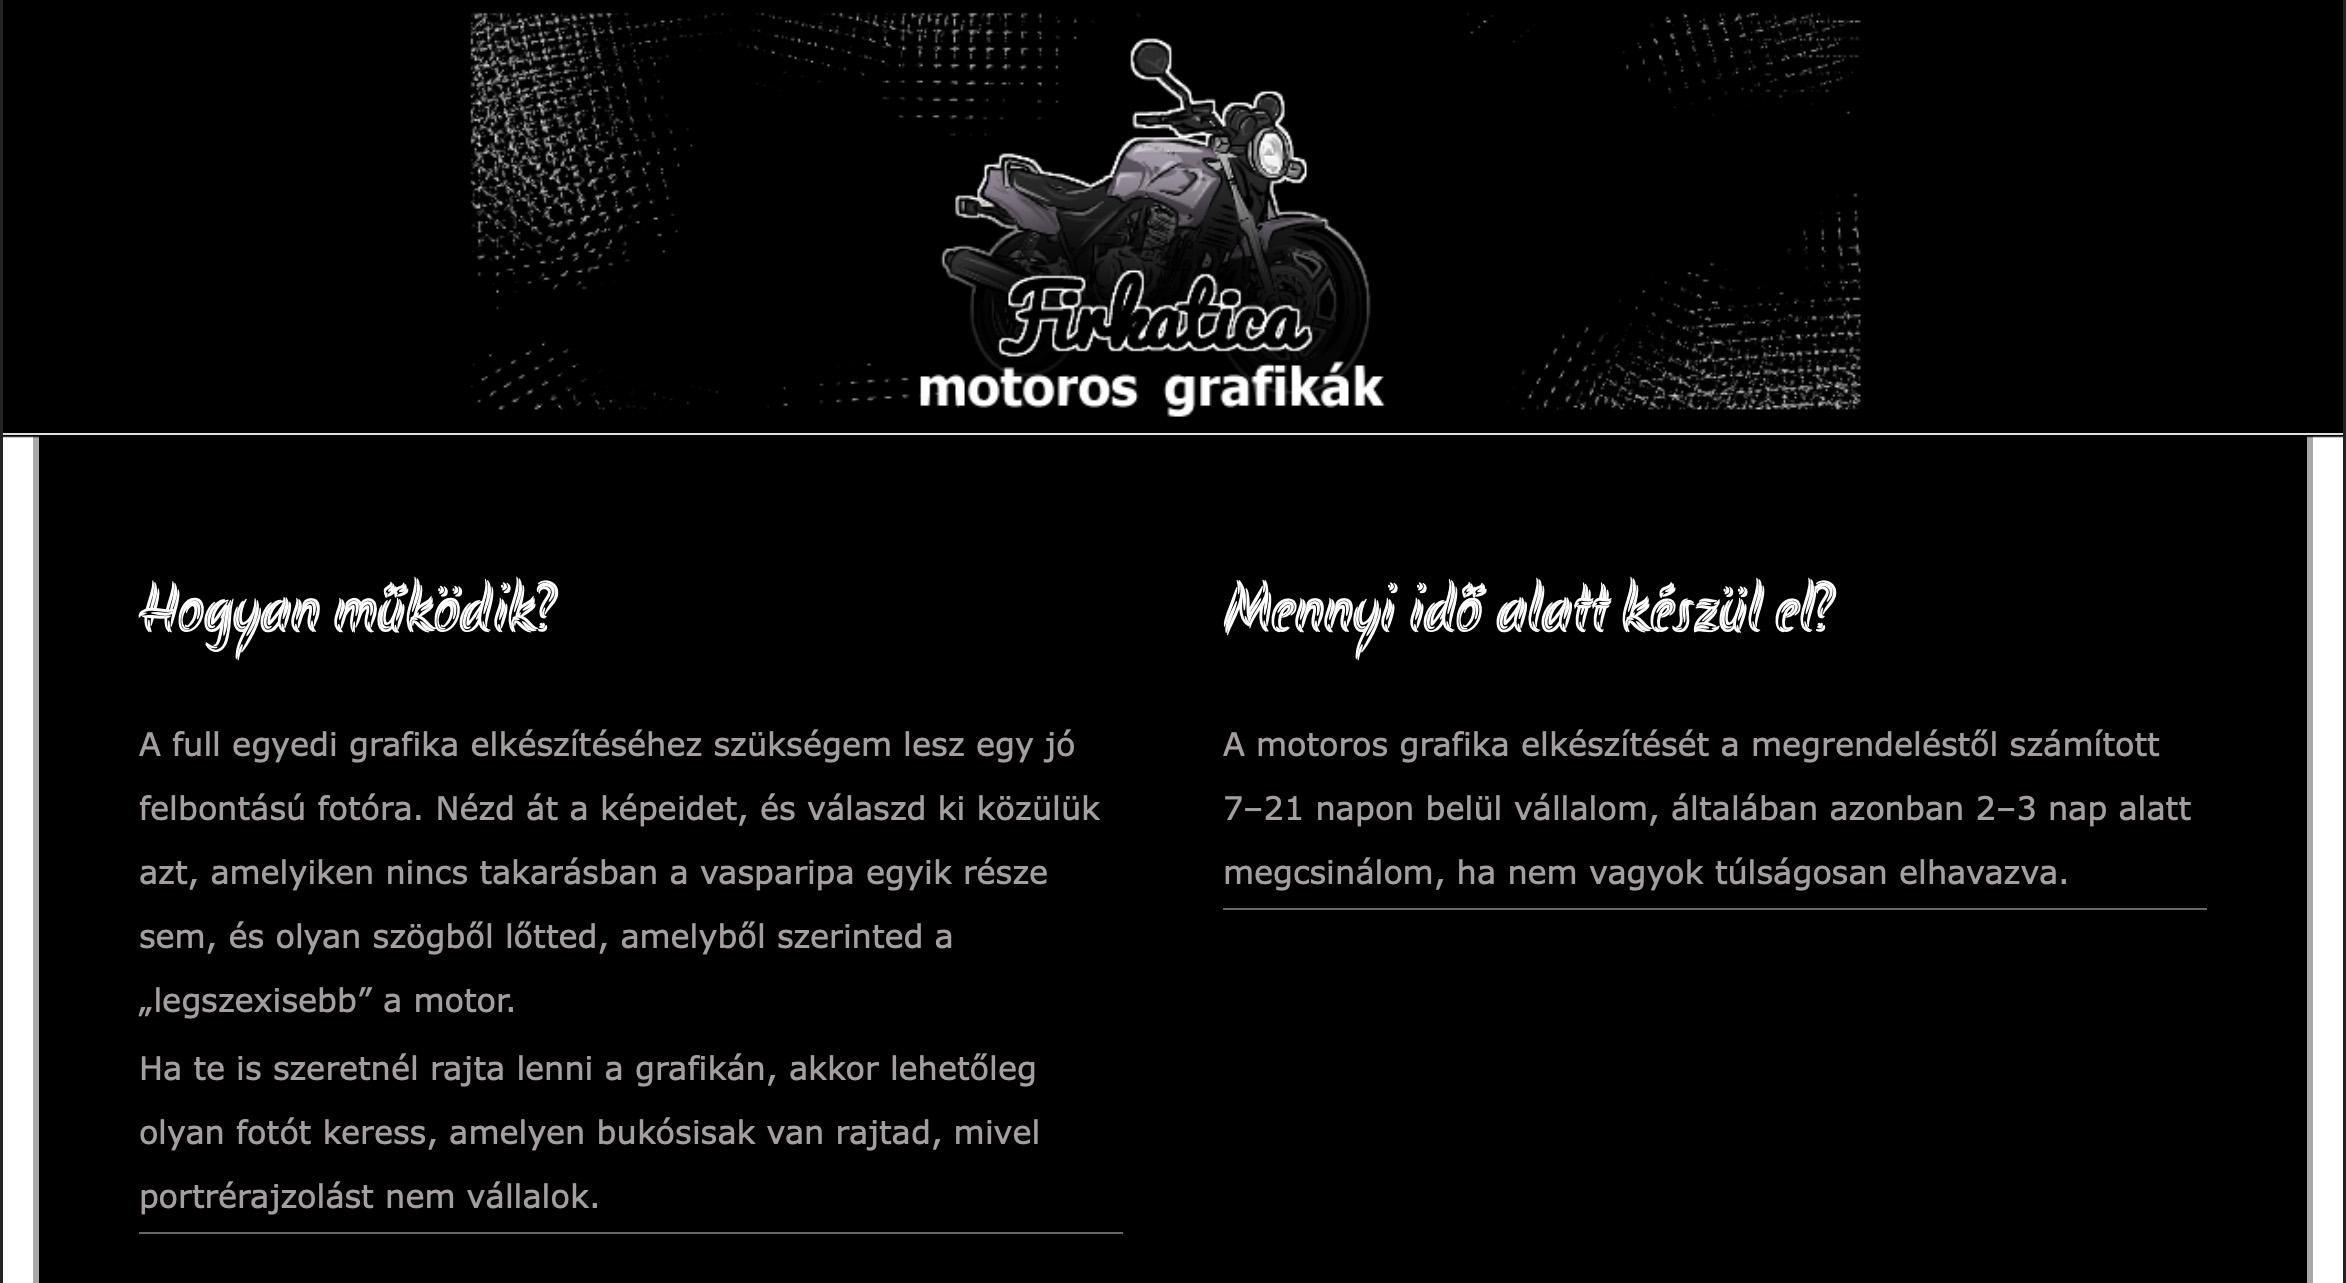 Firkatica motoros grafika korrektúra referencia